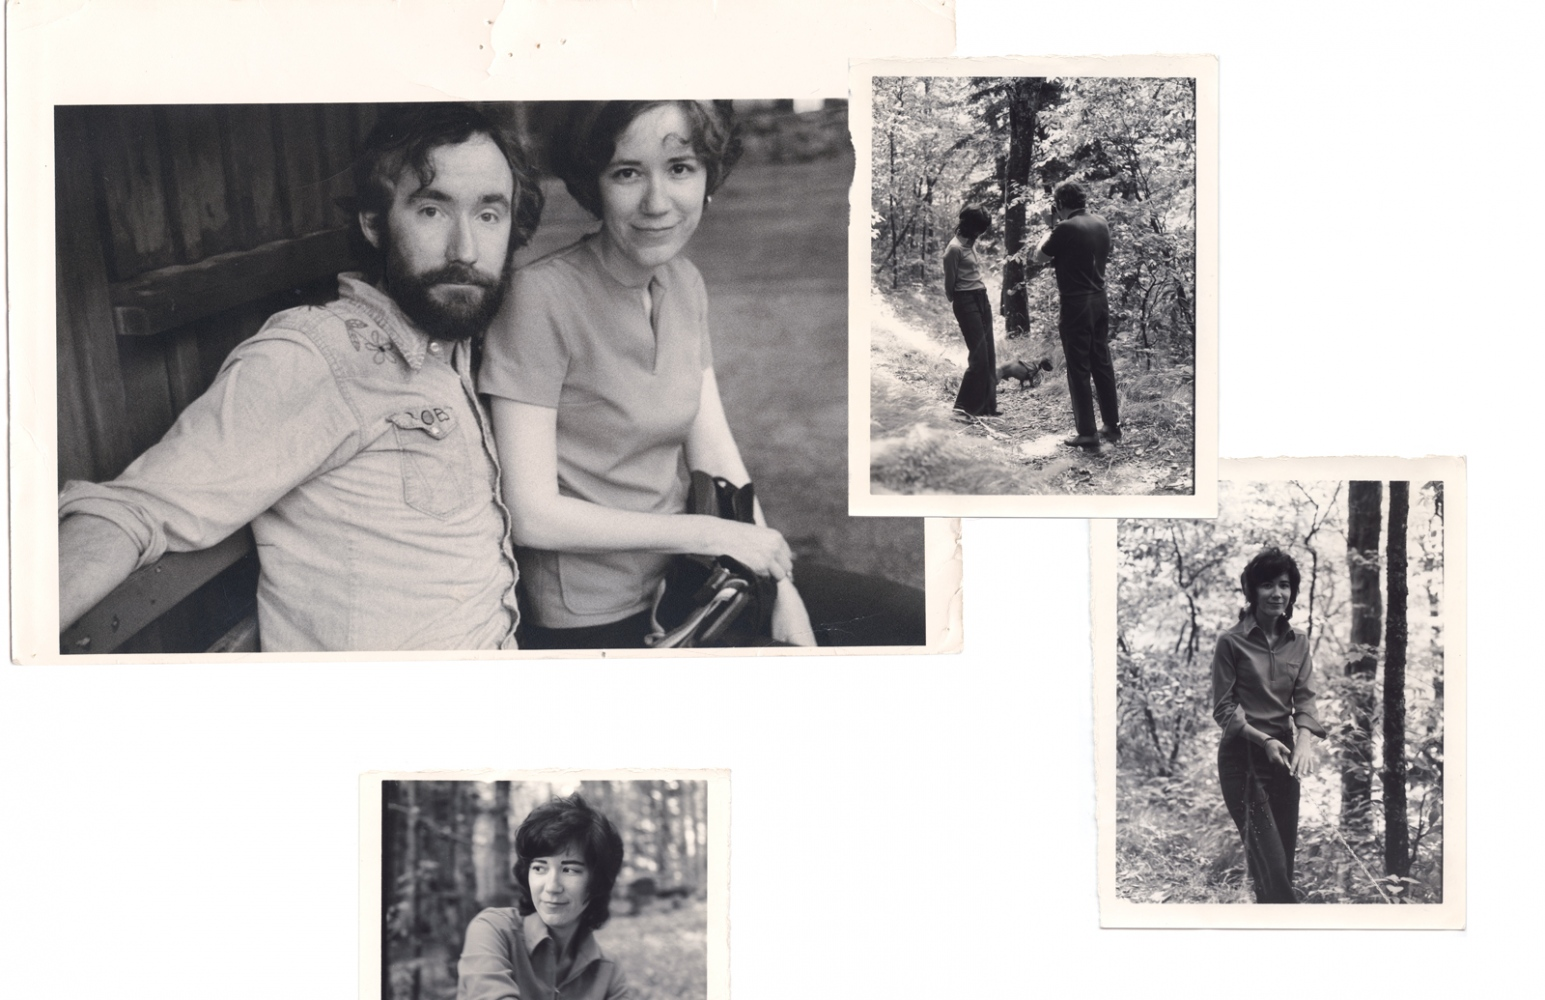 St. Louis and Washington DC, 1970s